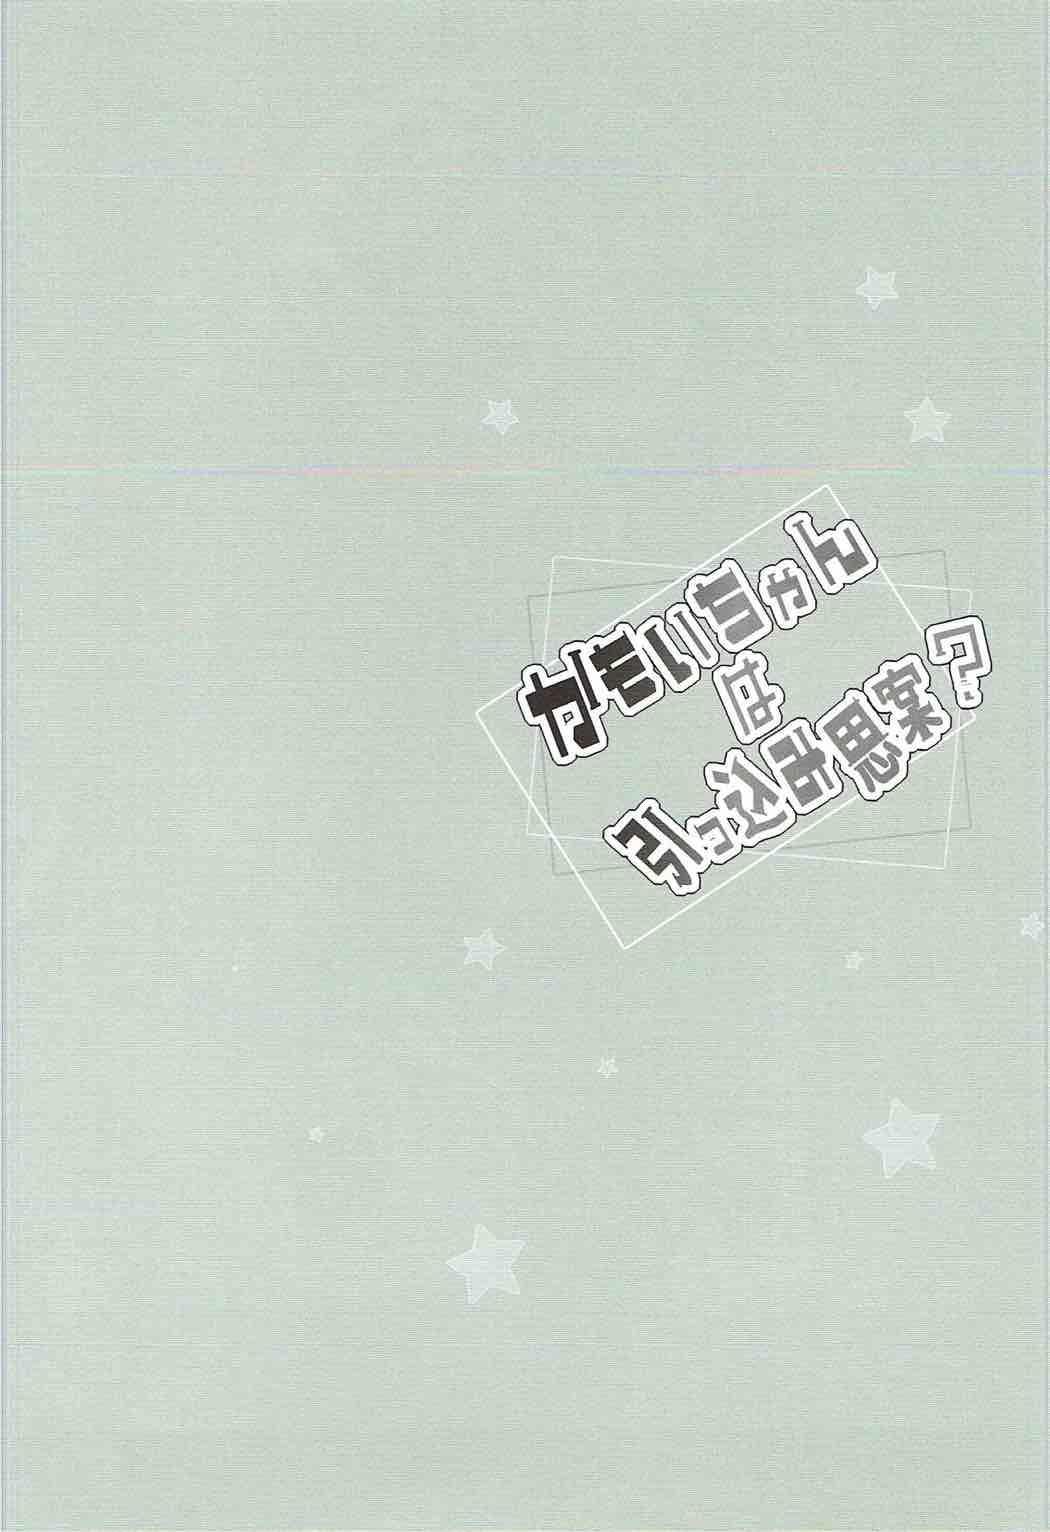 Kamoi-chan wa Hikkomijian? 2